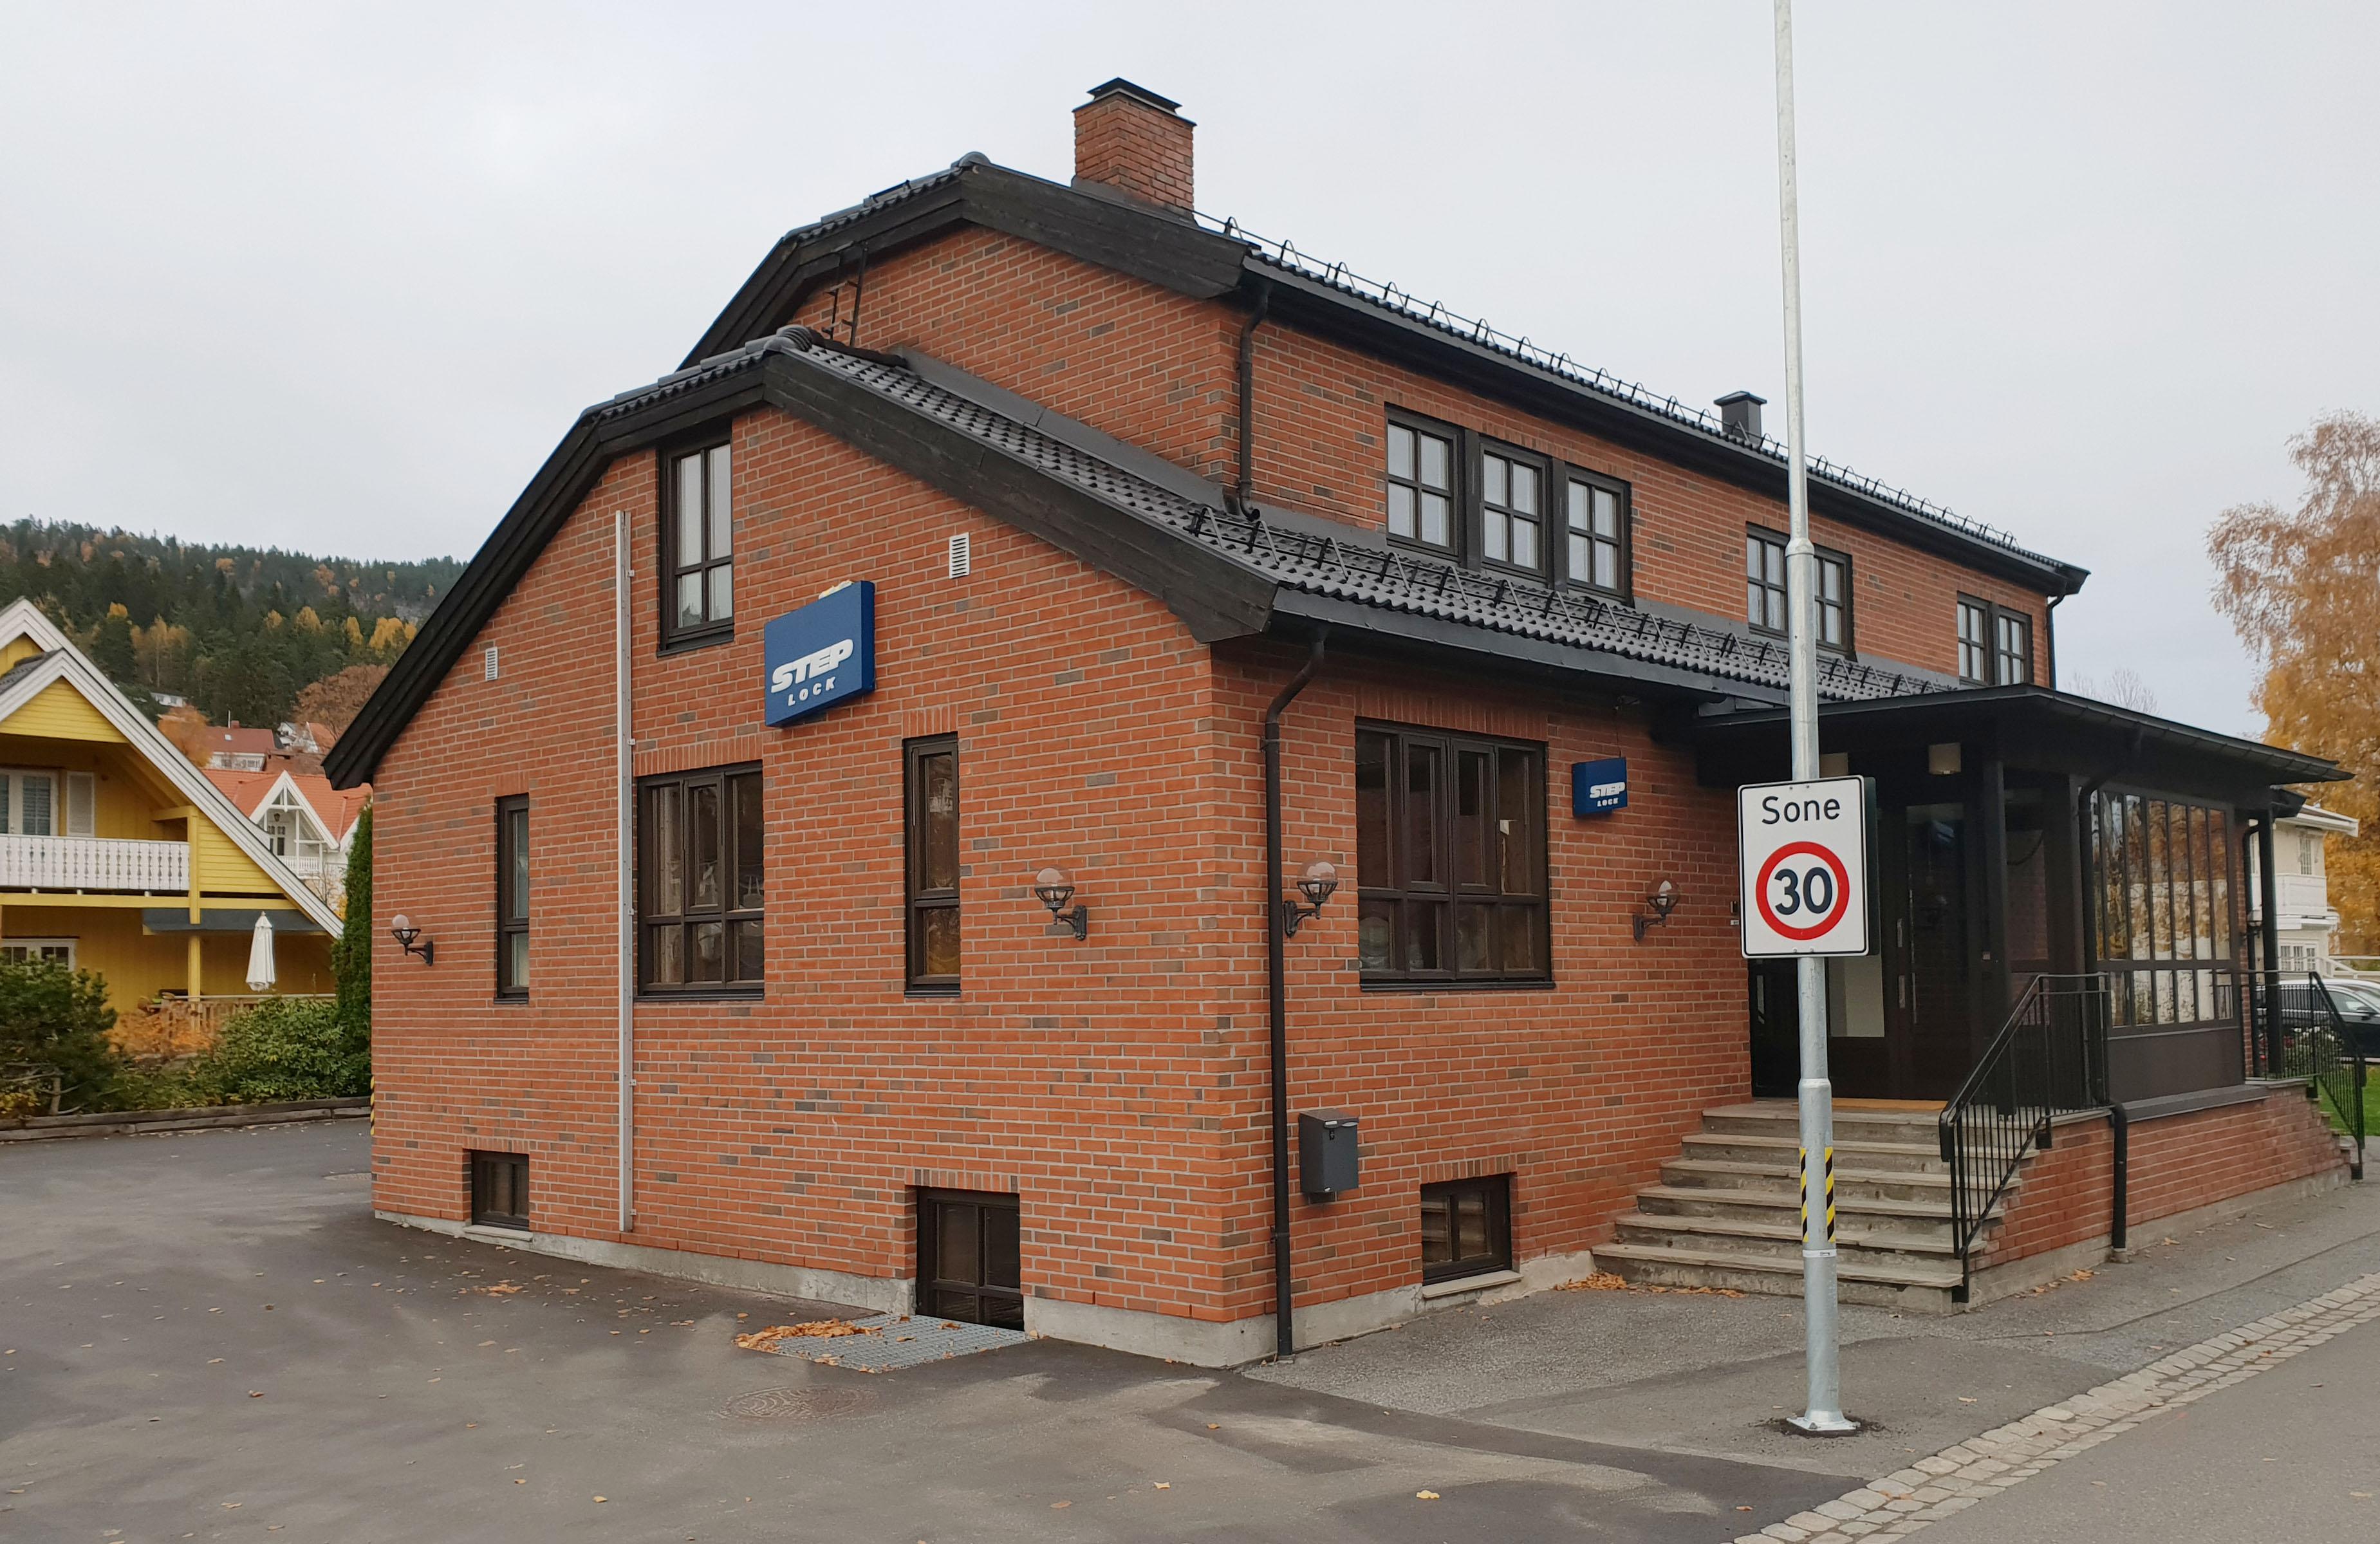 NY PROFIL: Slik ble fasaden hos Steplock Norway nŒr de nye skiletene kom pŒå plass.